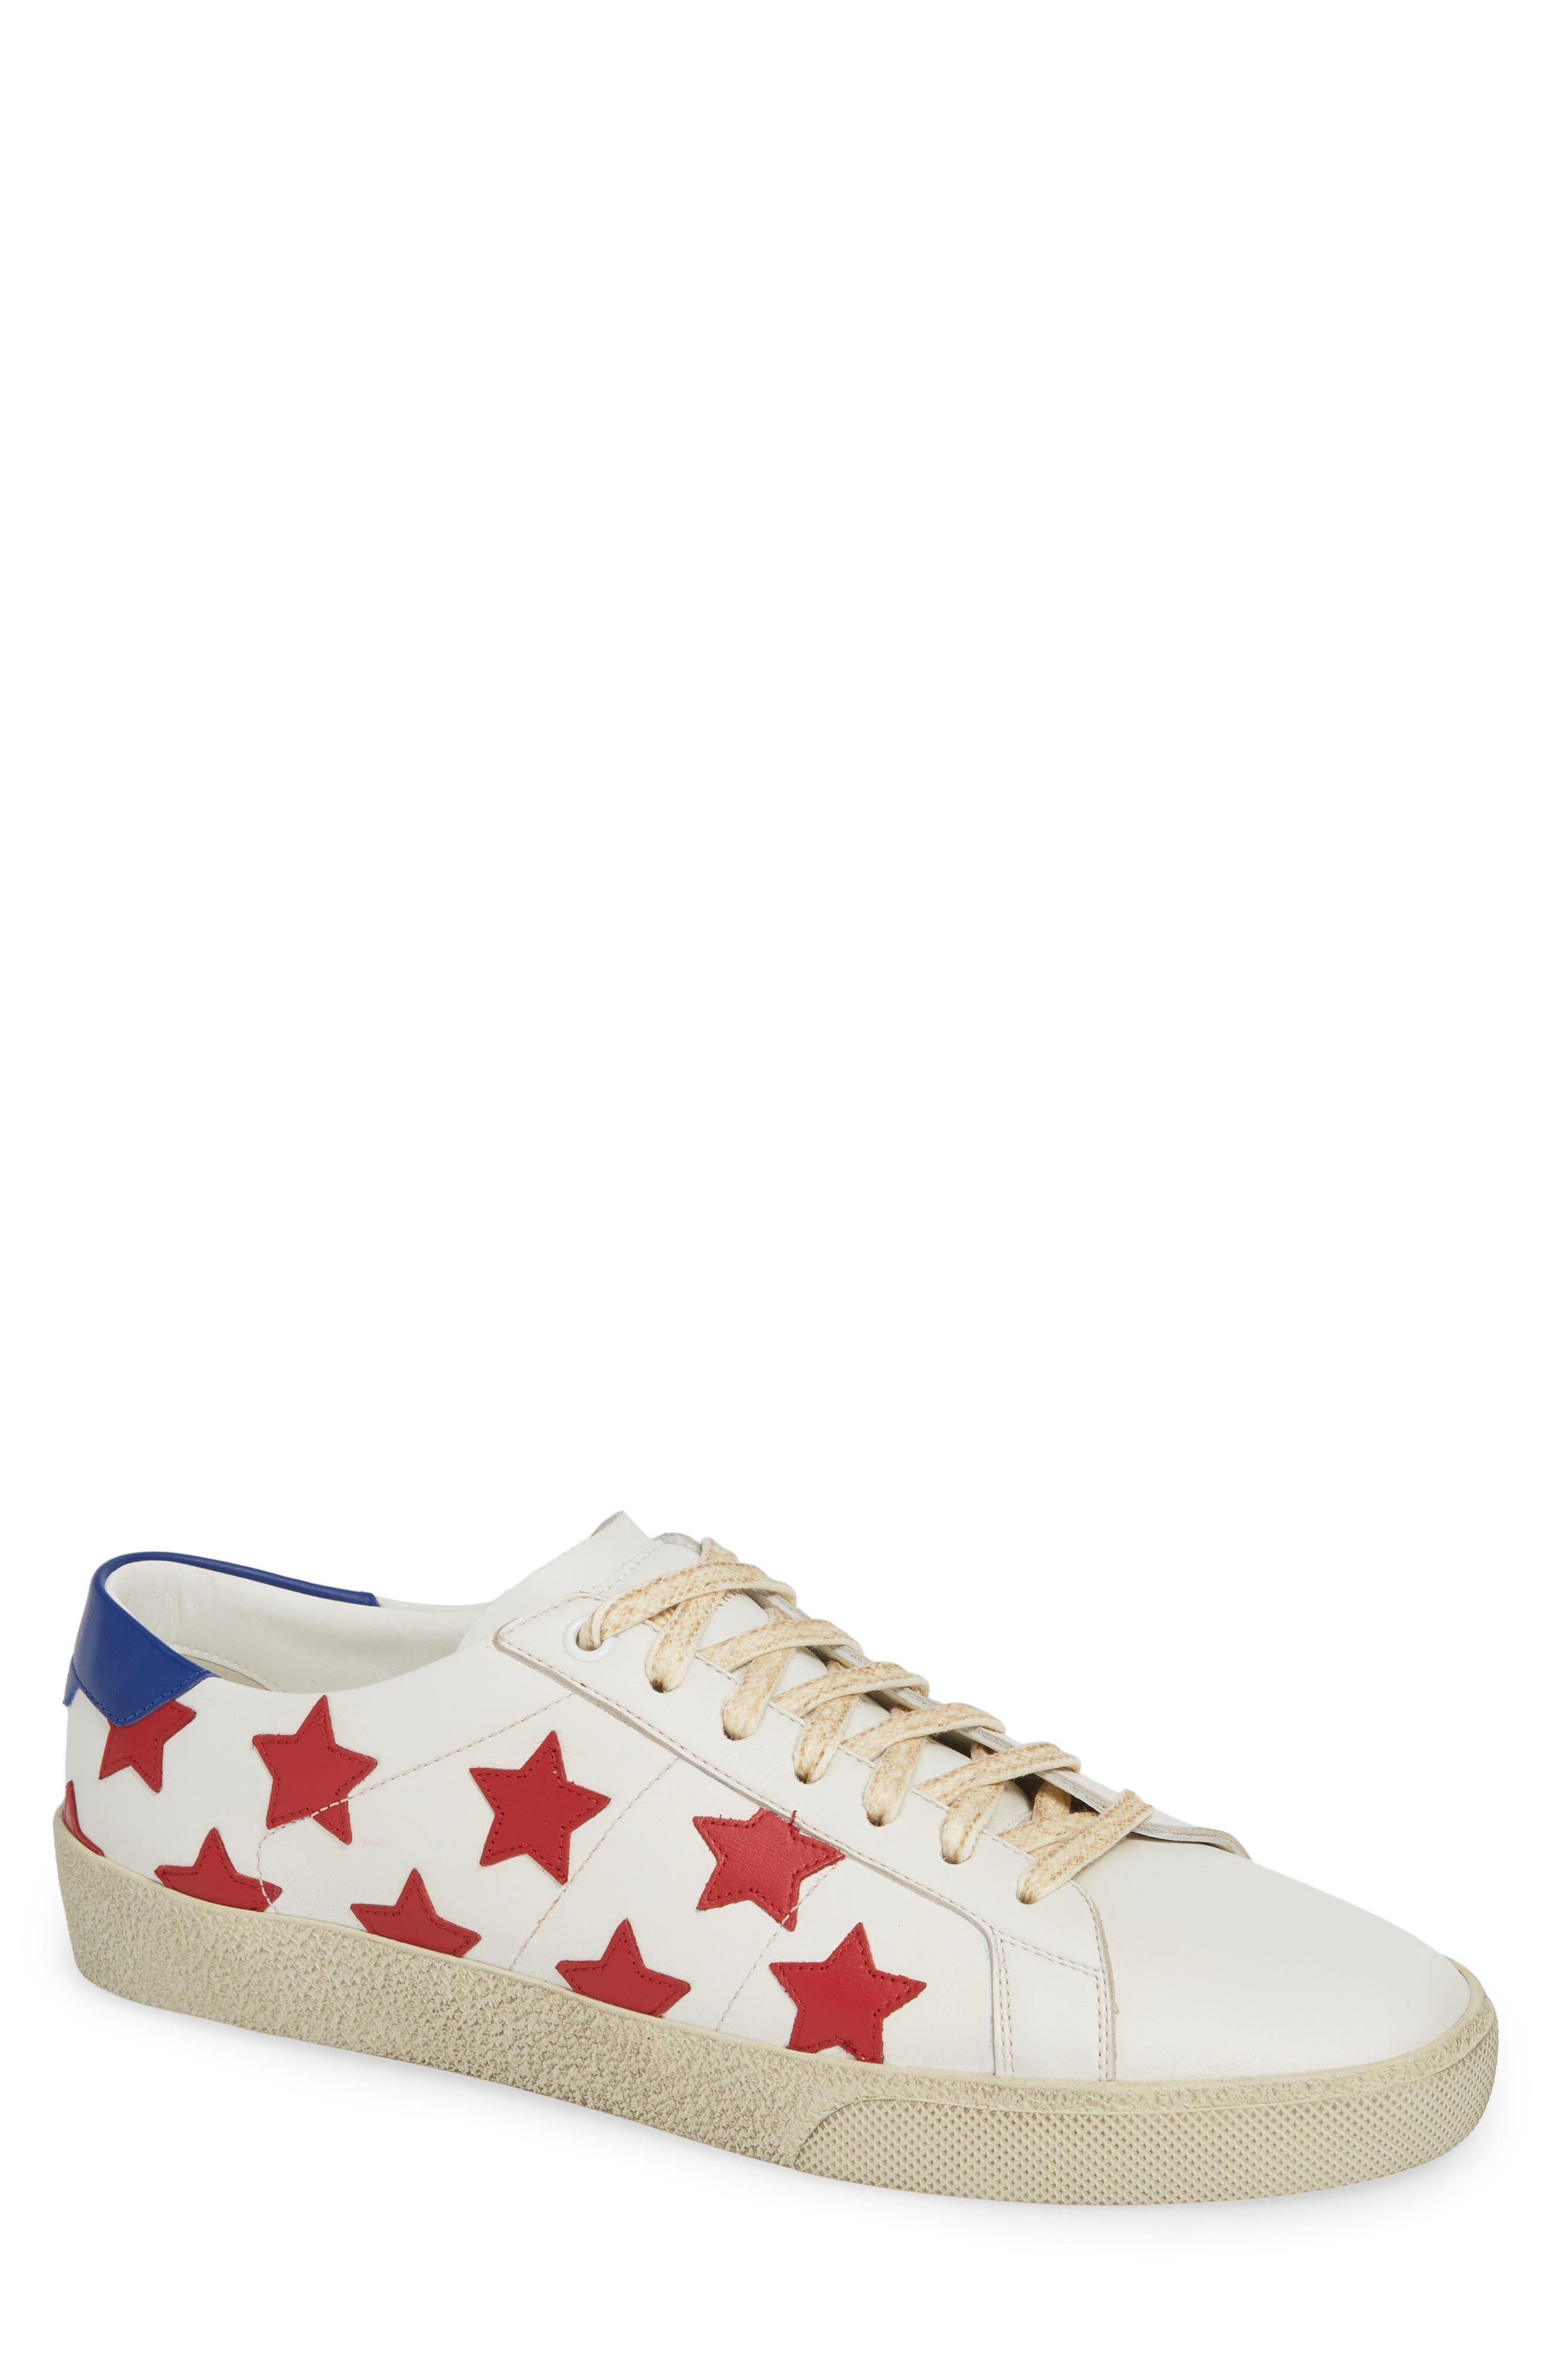 SAINT LAURENT,                             Star Low-Top Sneaker,                             Main thumbnail 1, color,                             WHITE/ MULTI